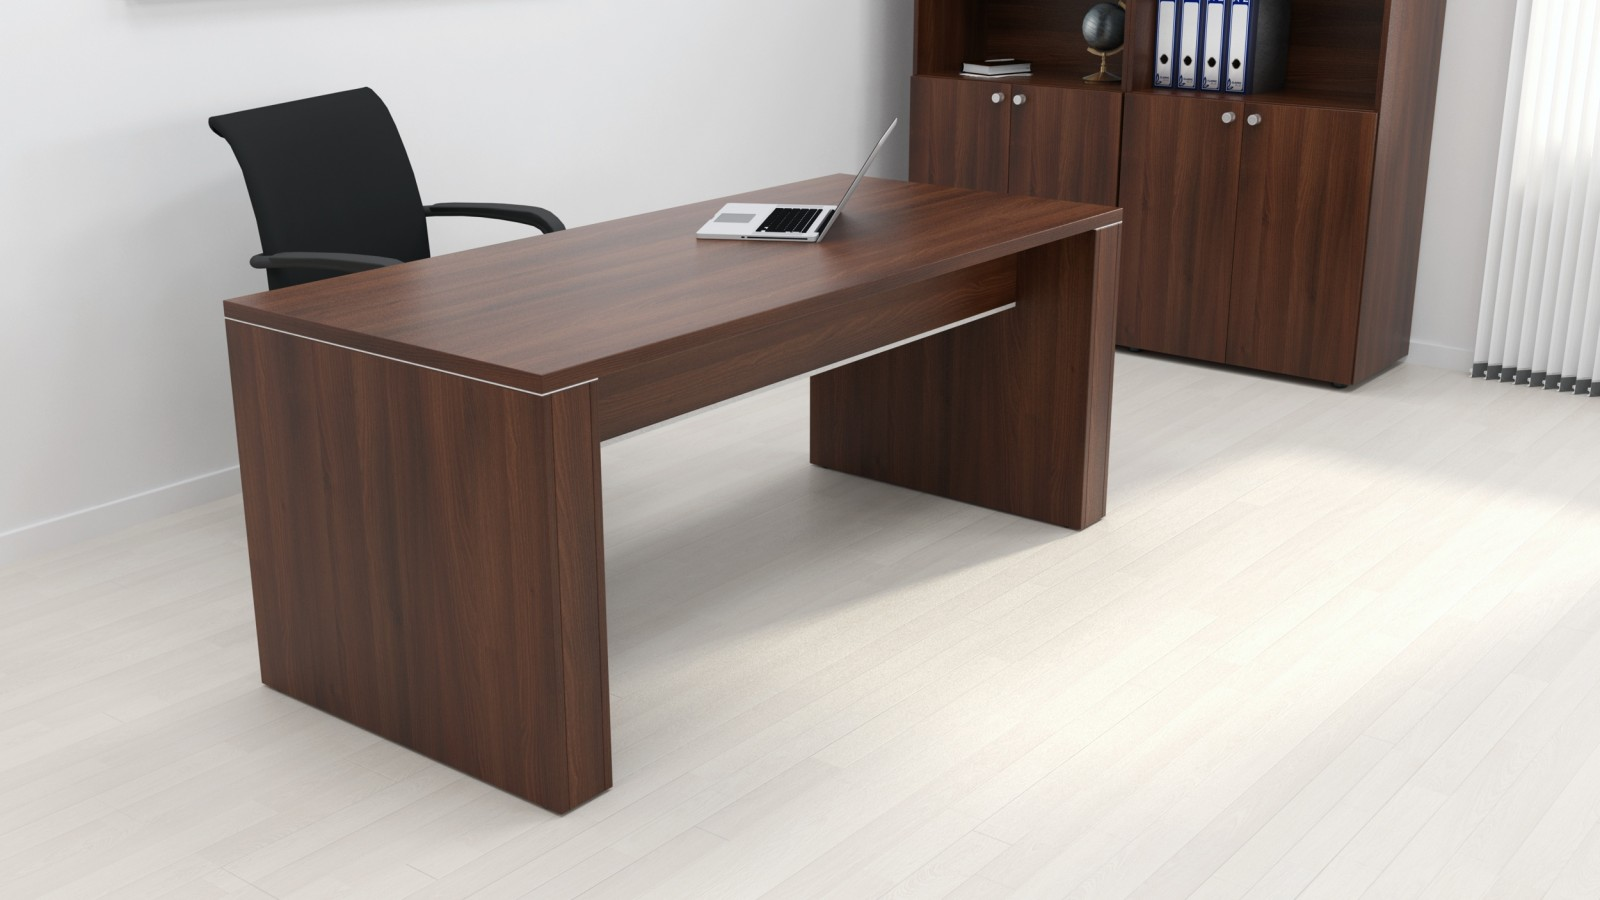 Mesa de despacho estilo clásico | Serie Clasic | Mobiofic.com